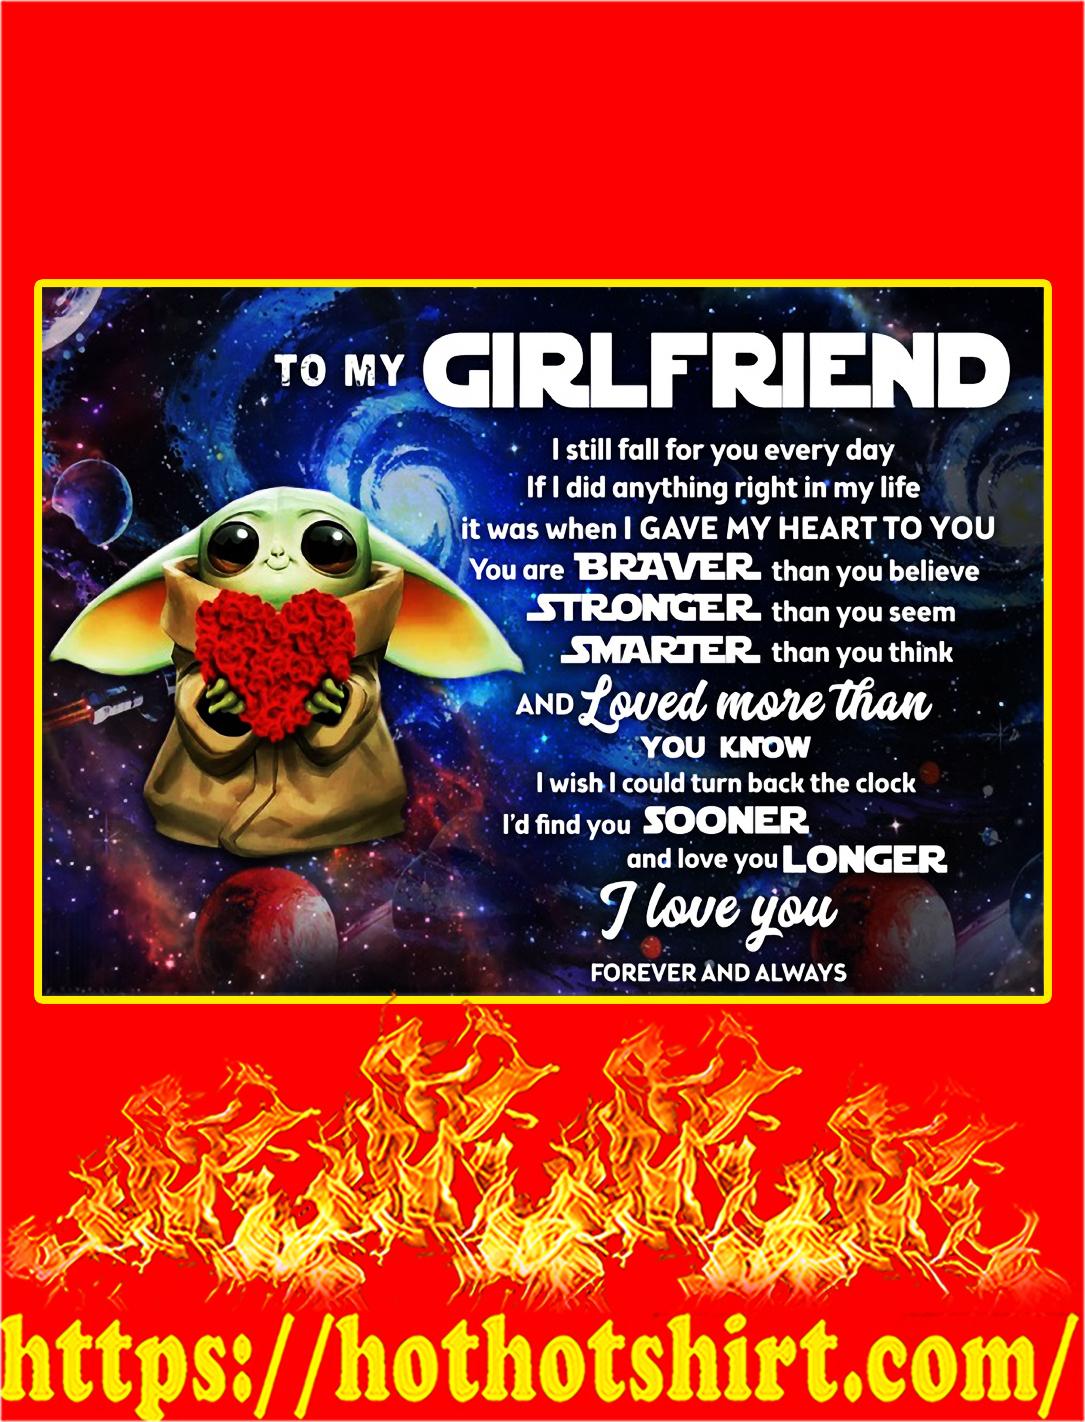 Baby yoda to my girlfriend poster